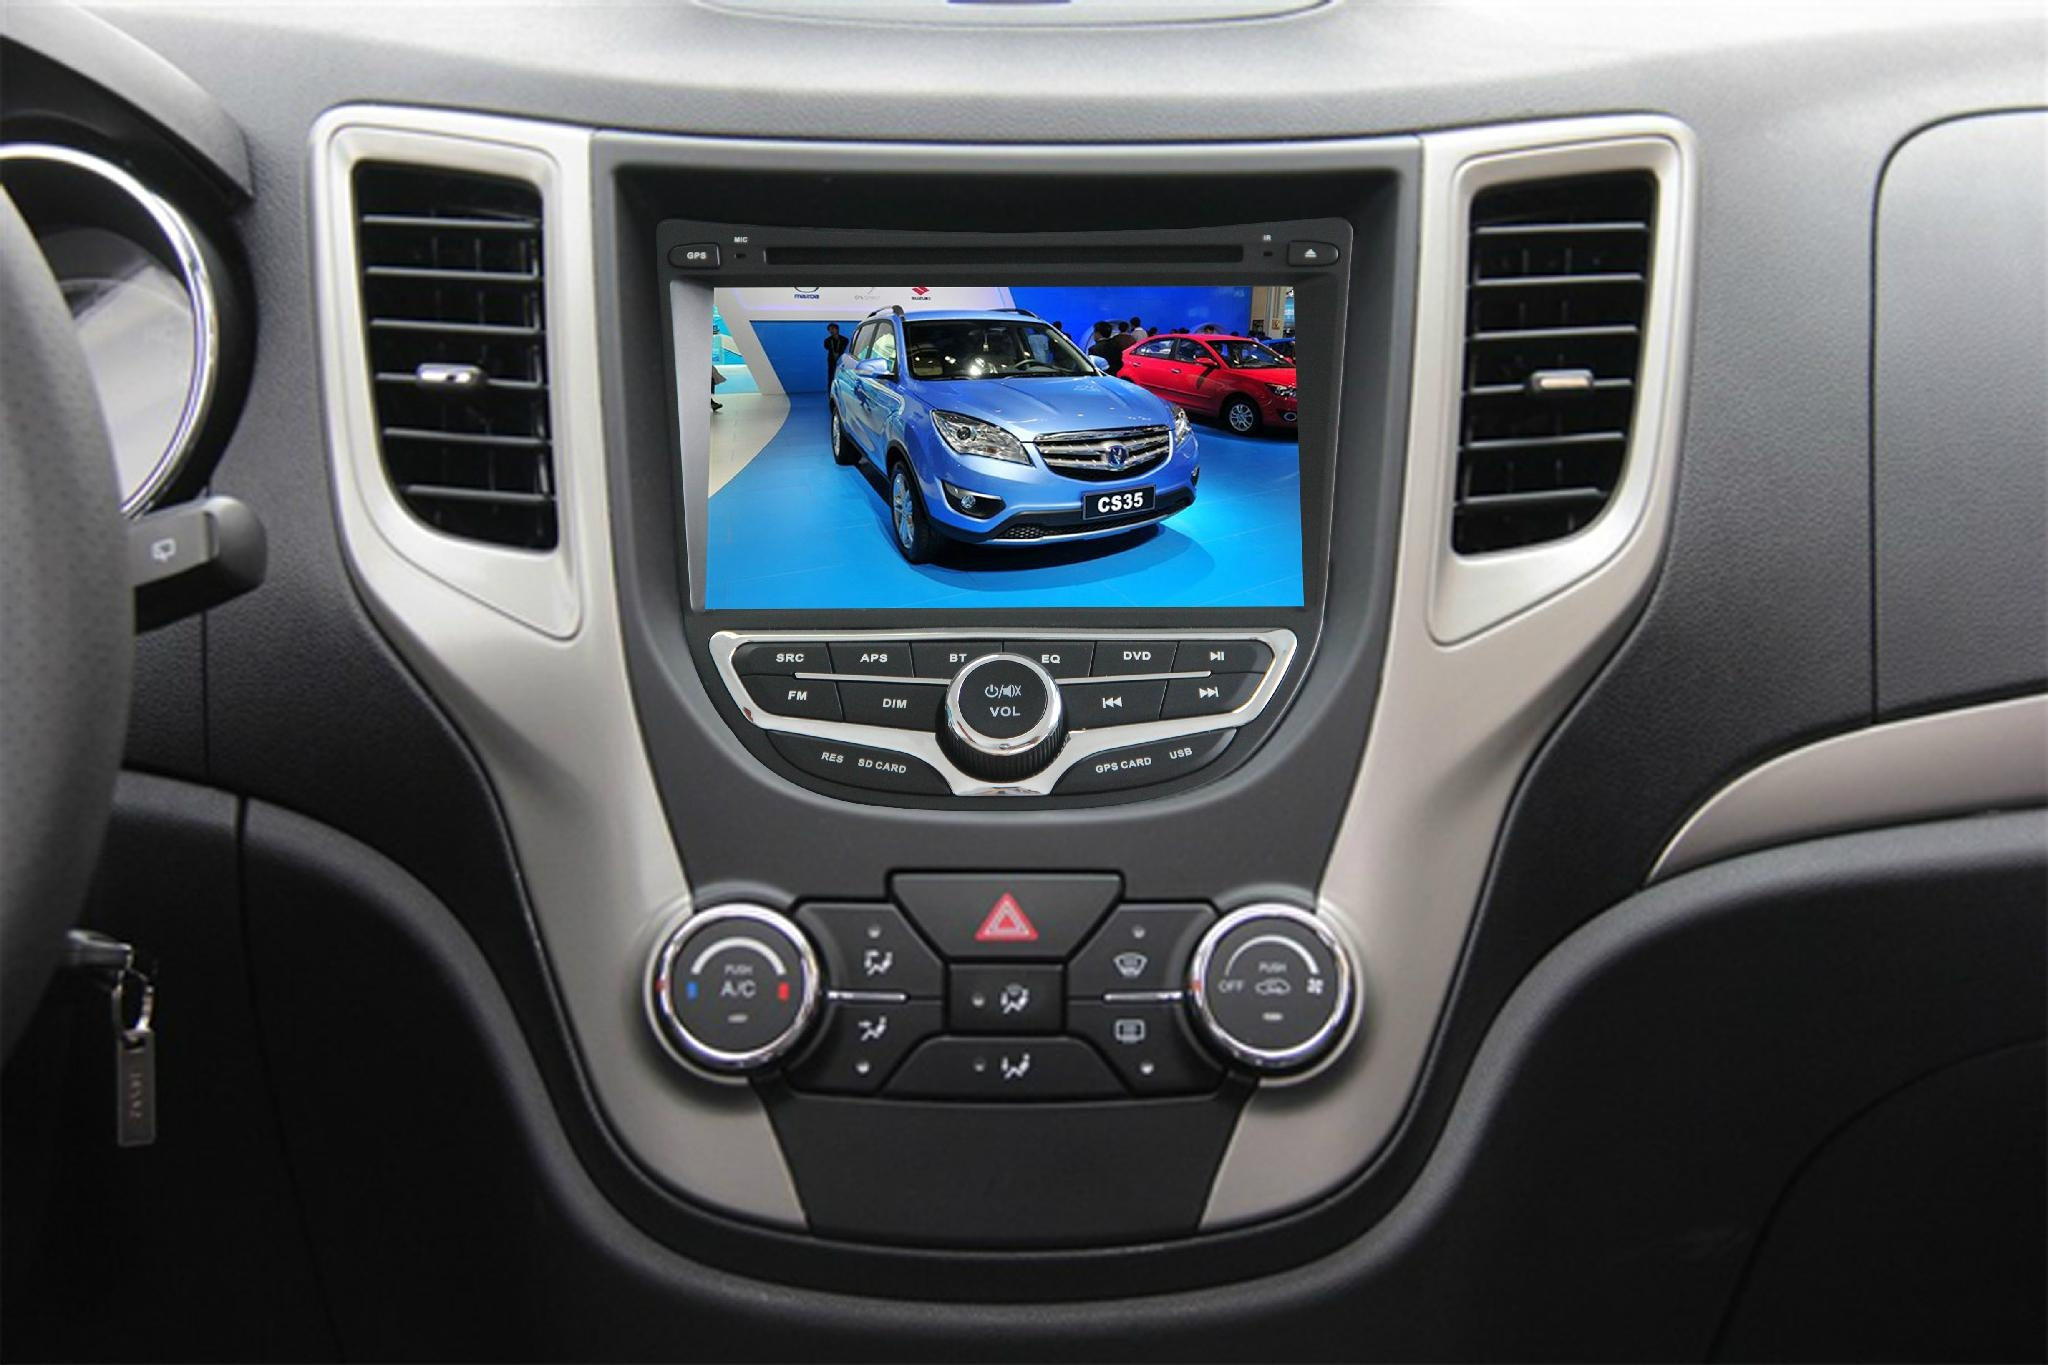 Diy Car Entertainment : Multimedia car entertainment system for changan cs